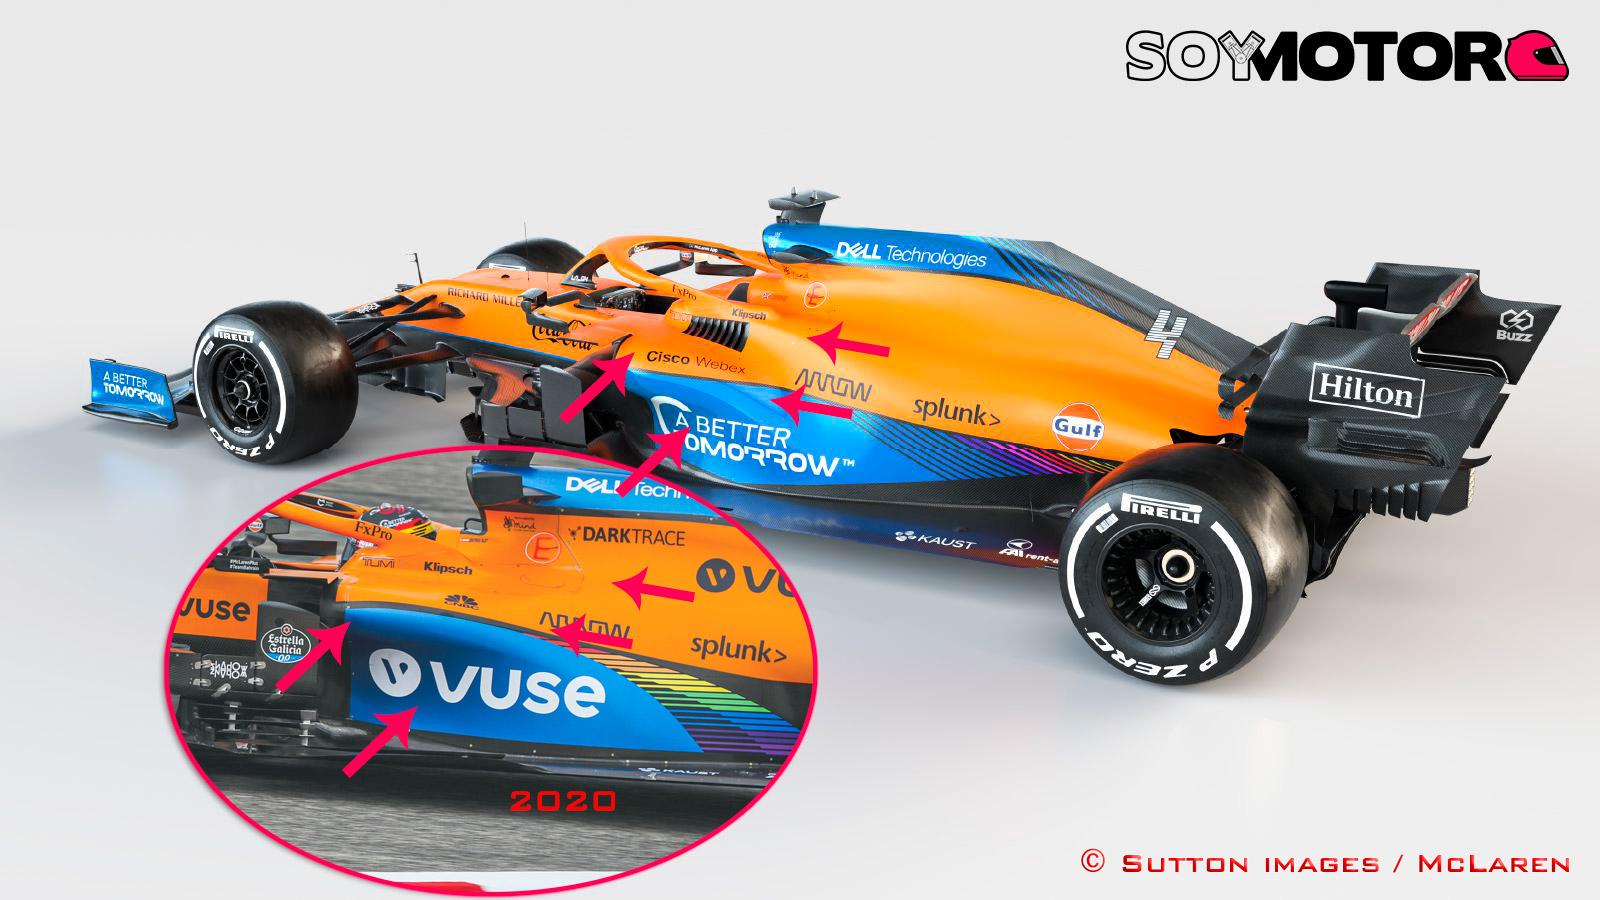 mcl35m-chasis-3.jpg